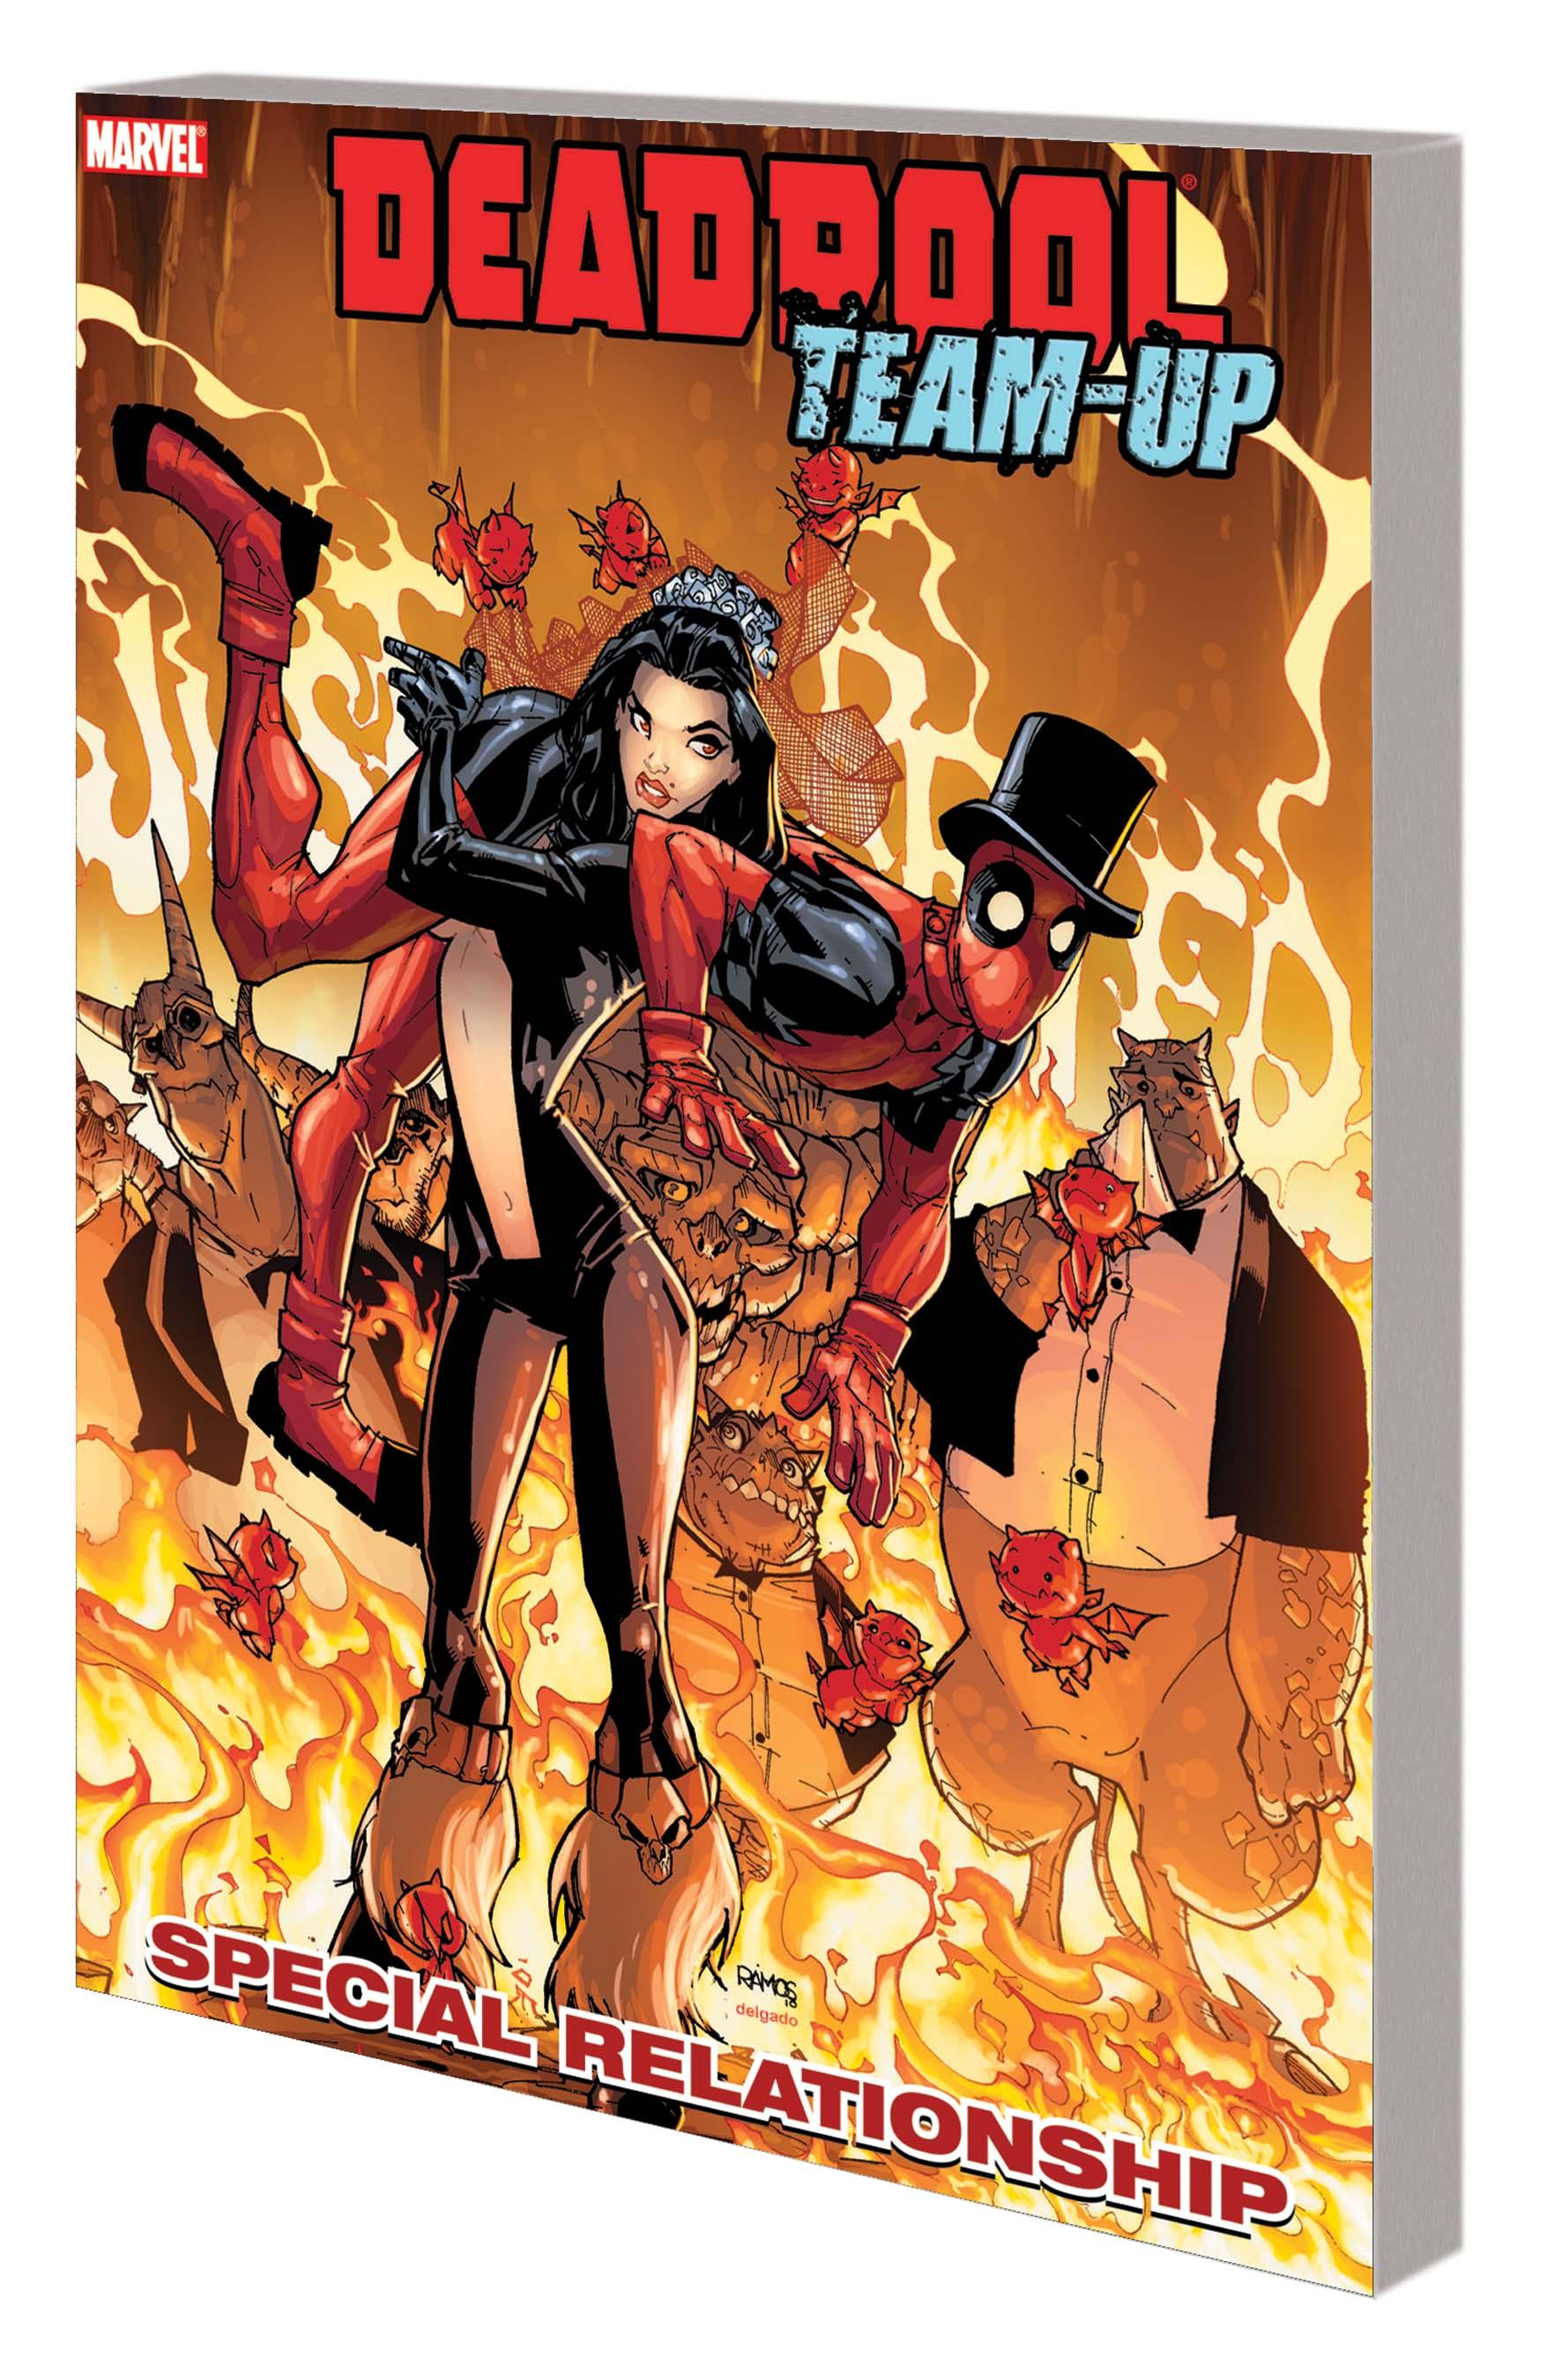 Deadpool Team-Up Vol. 2: Special Relationship (Trade Paperback)